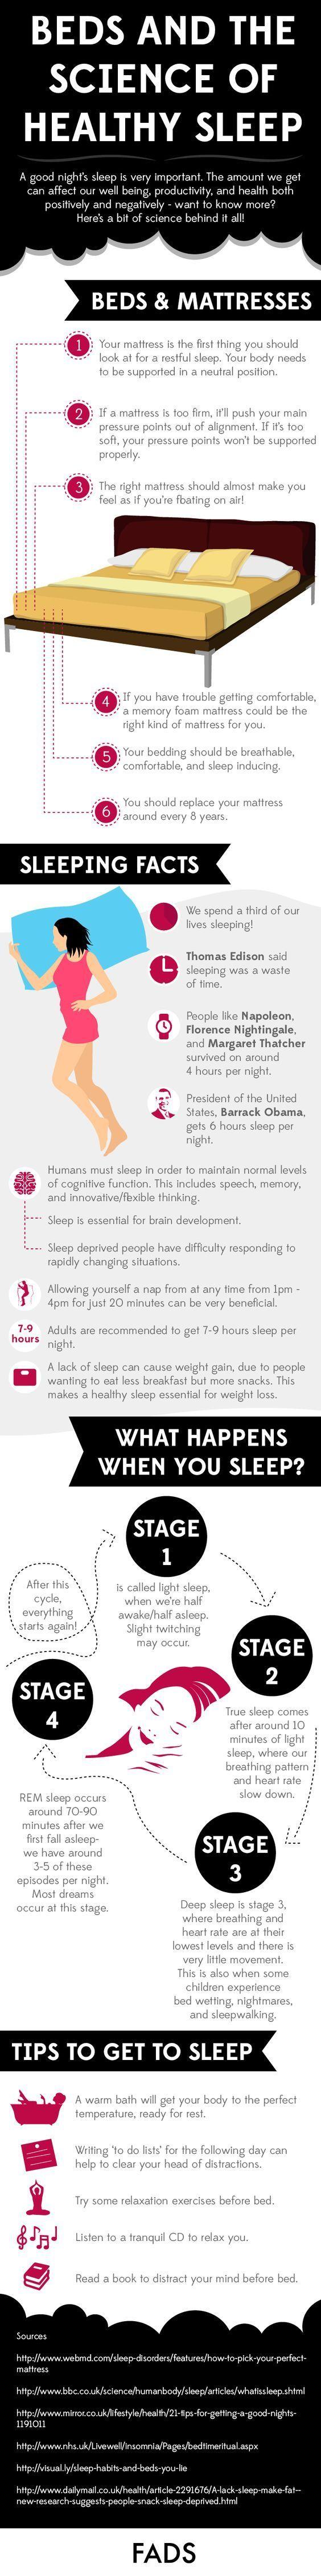 Get a Restful Night Sleep